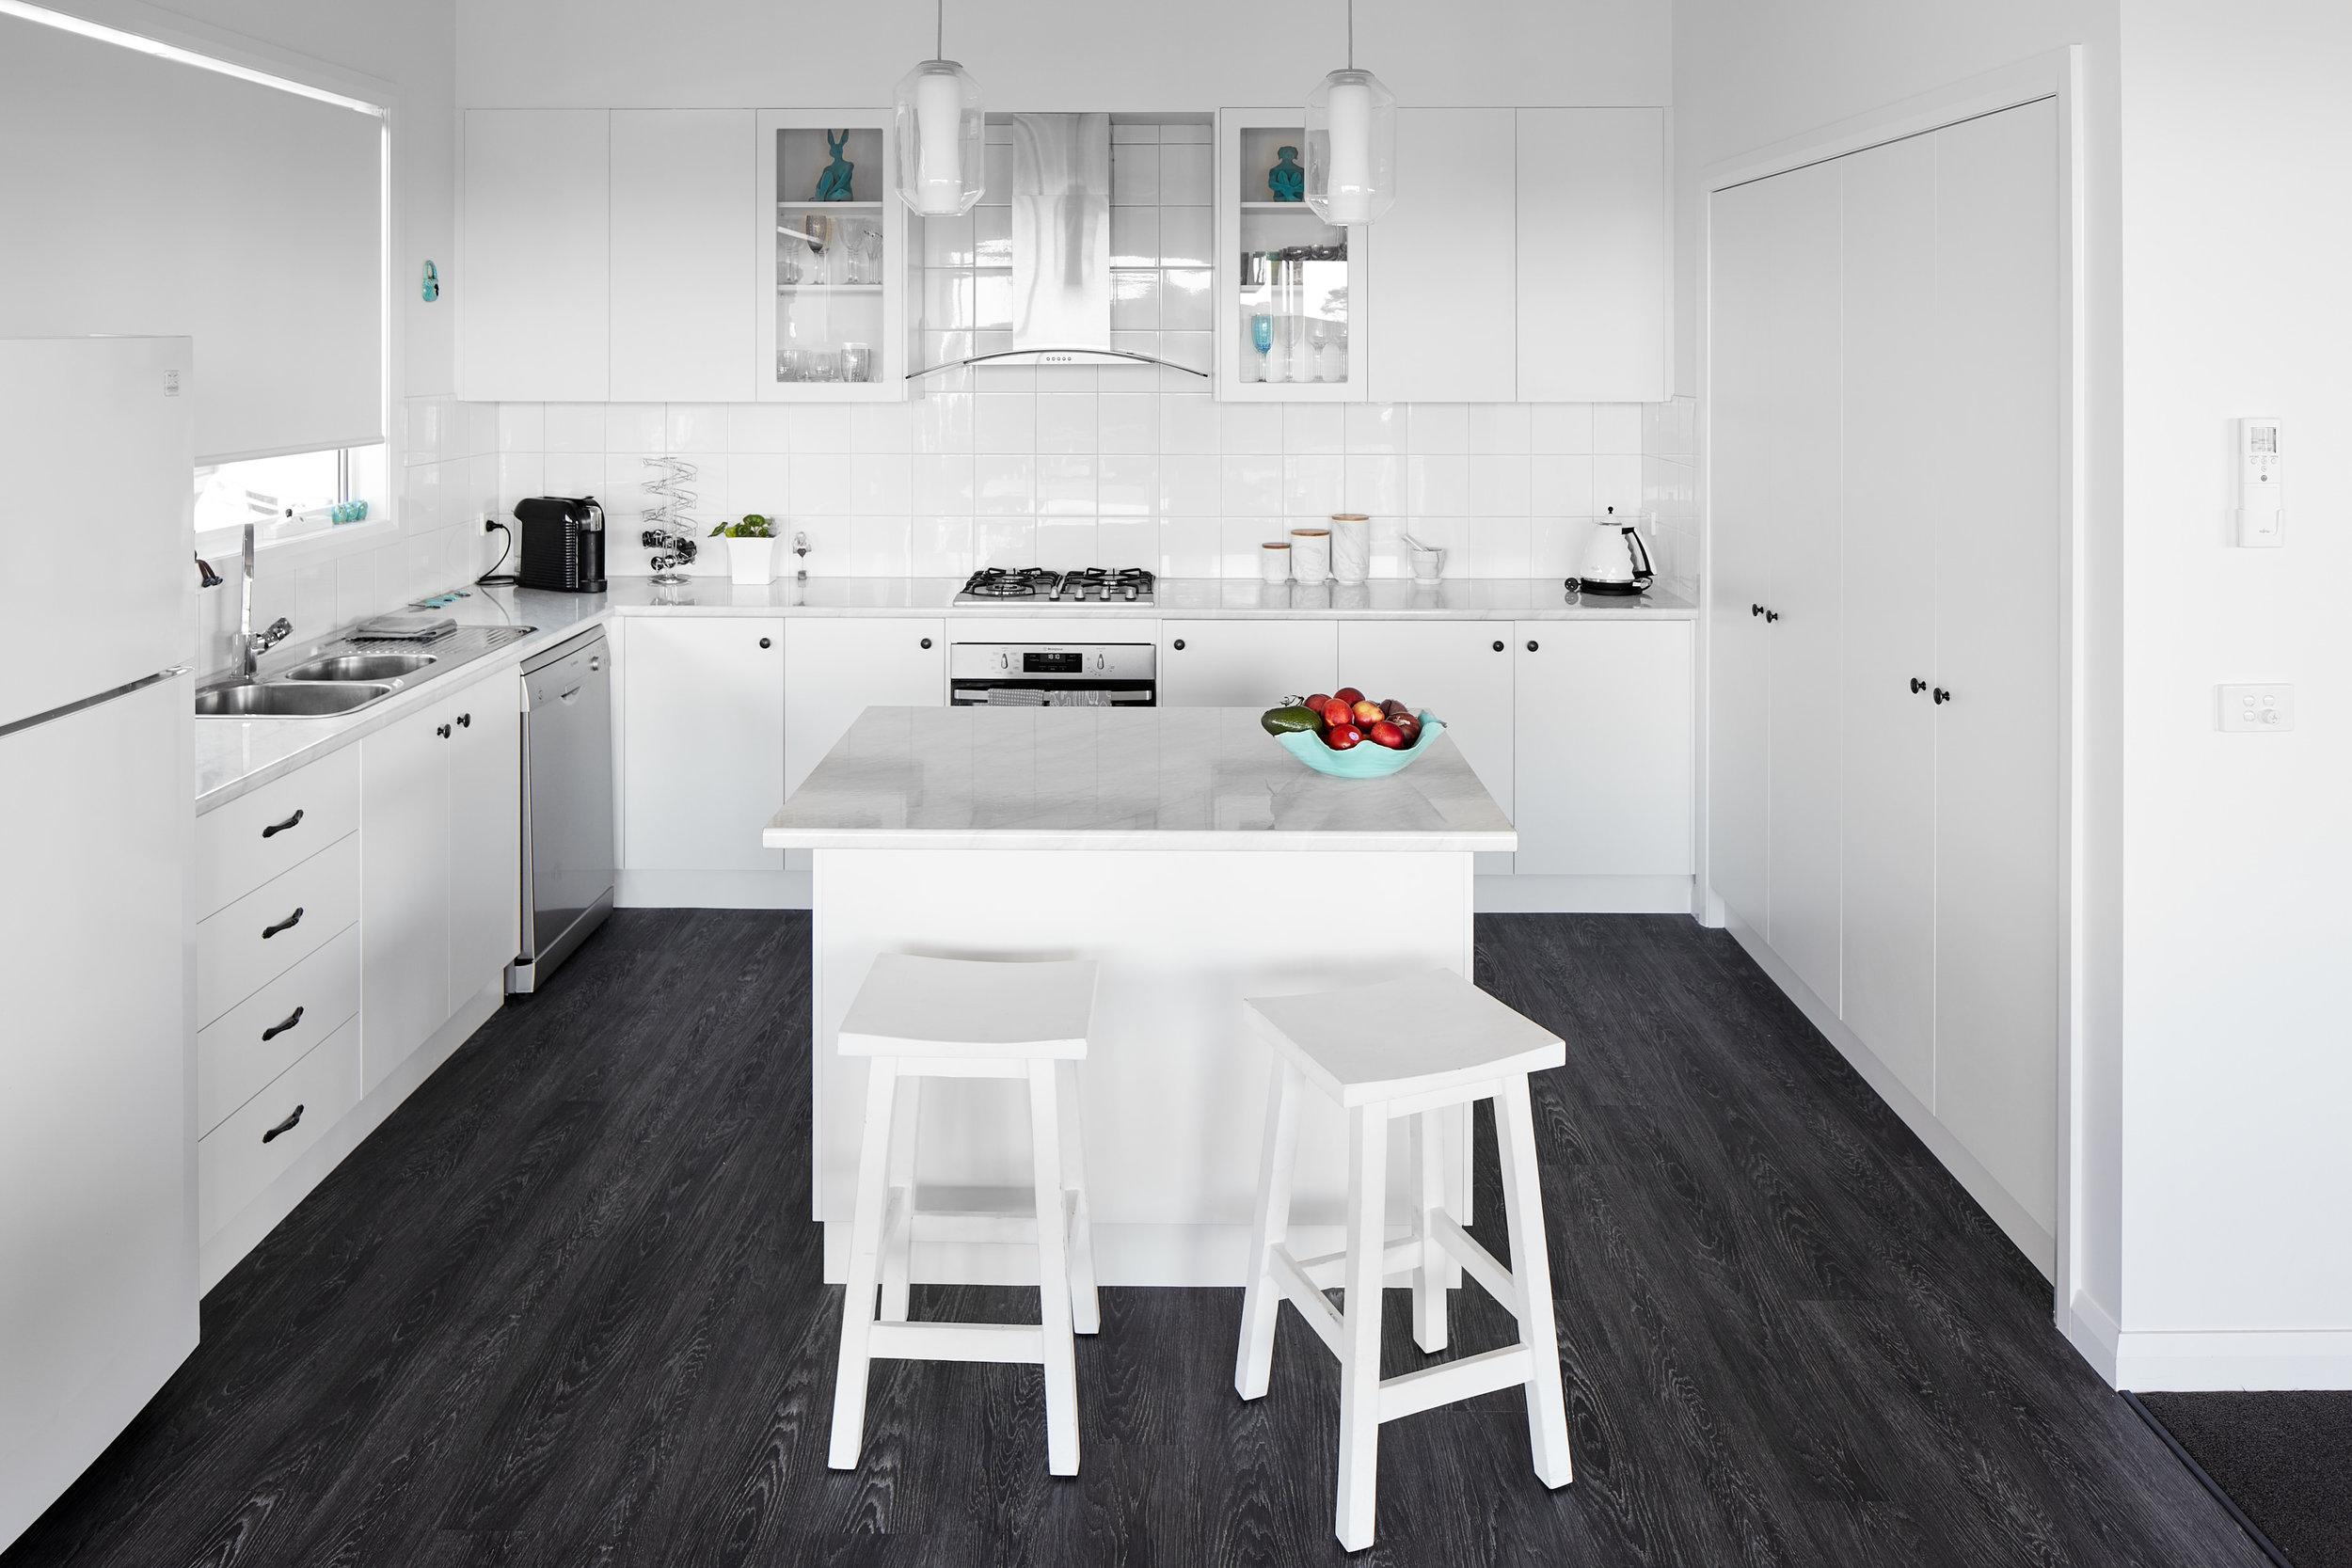 nathan-k-davis-nathankdavis-1nkd-architectural-photography-melbourne-victoria-australia-residential-2